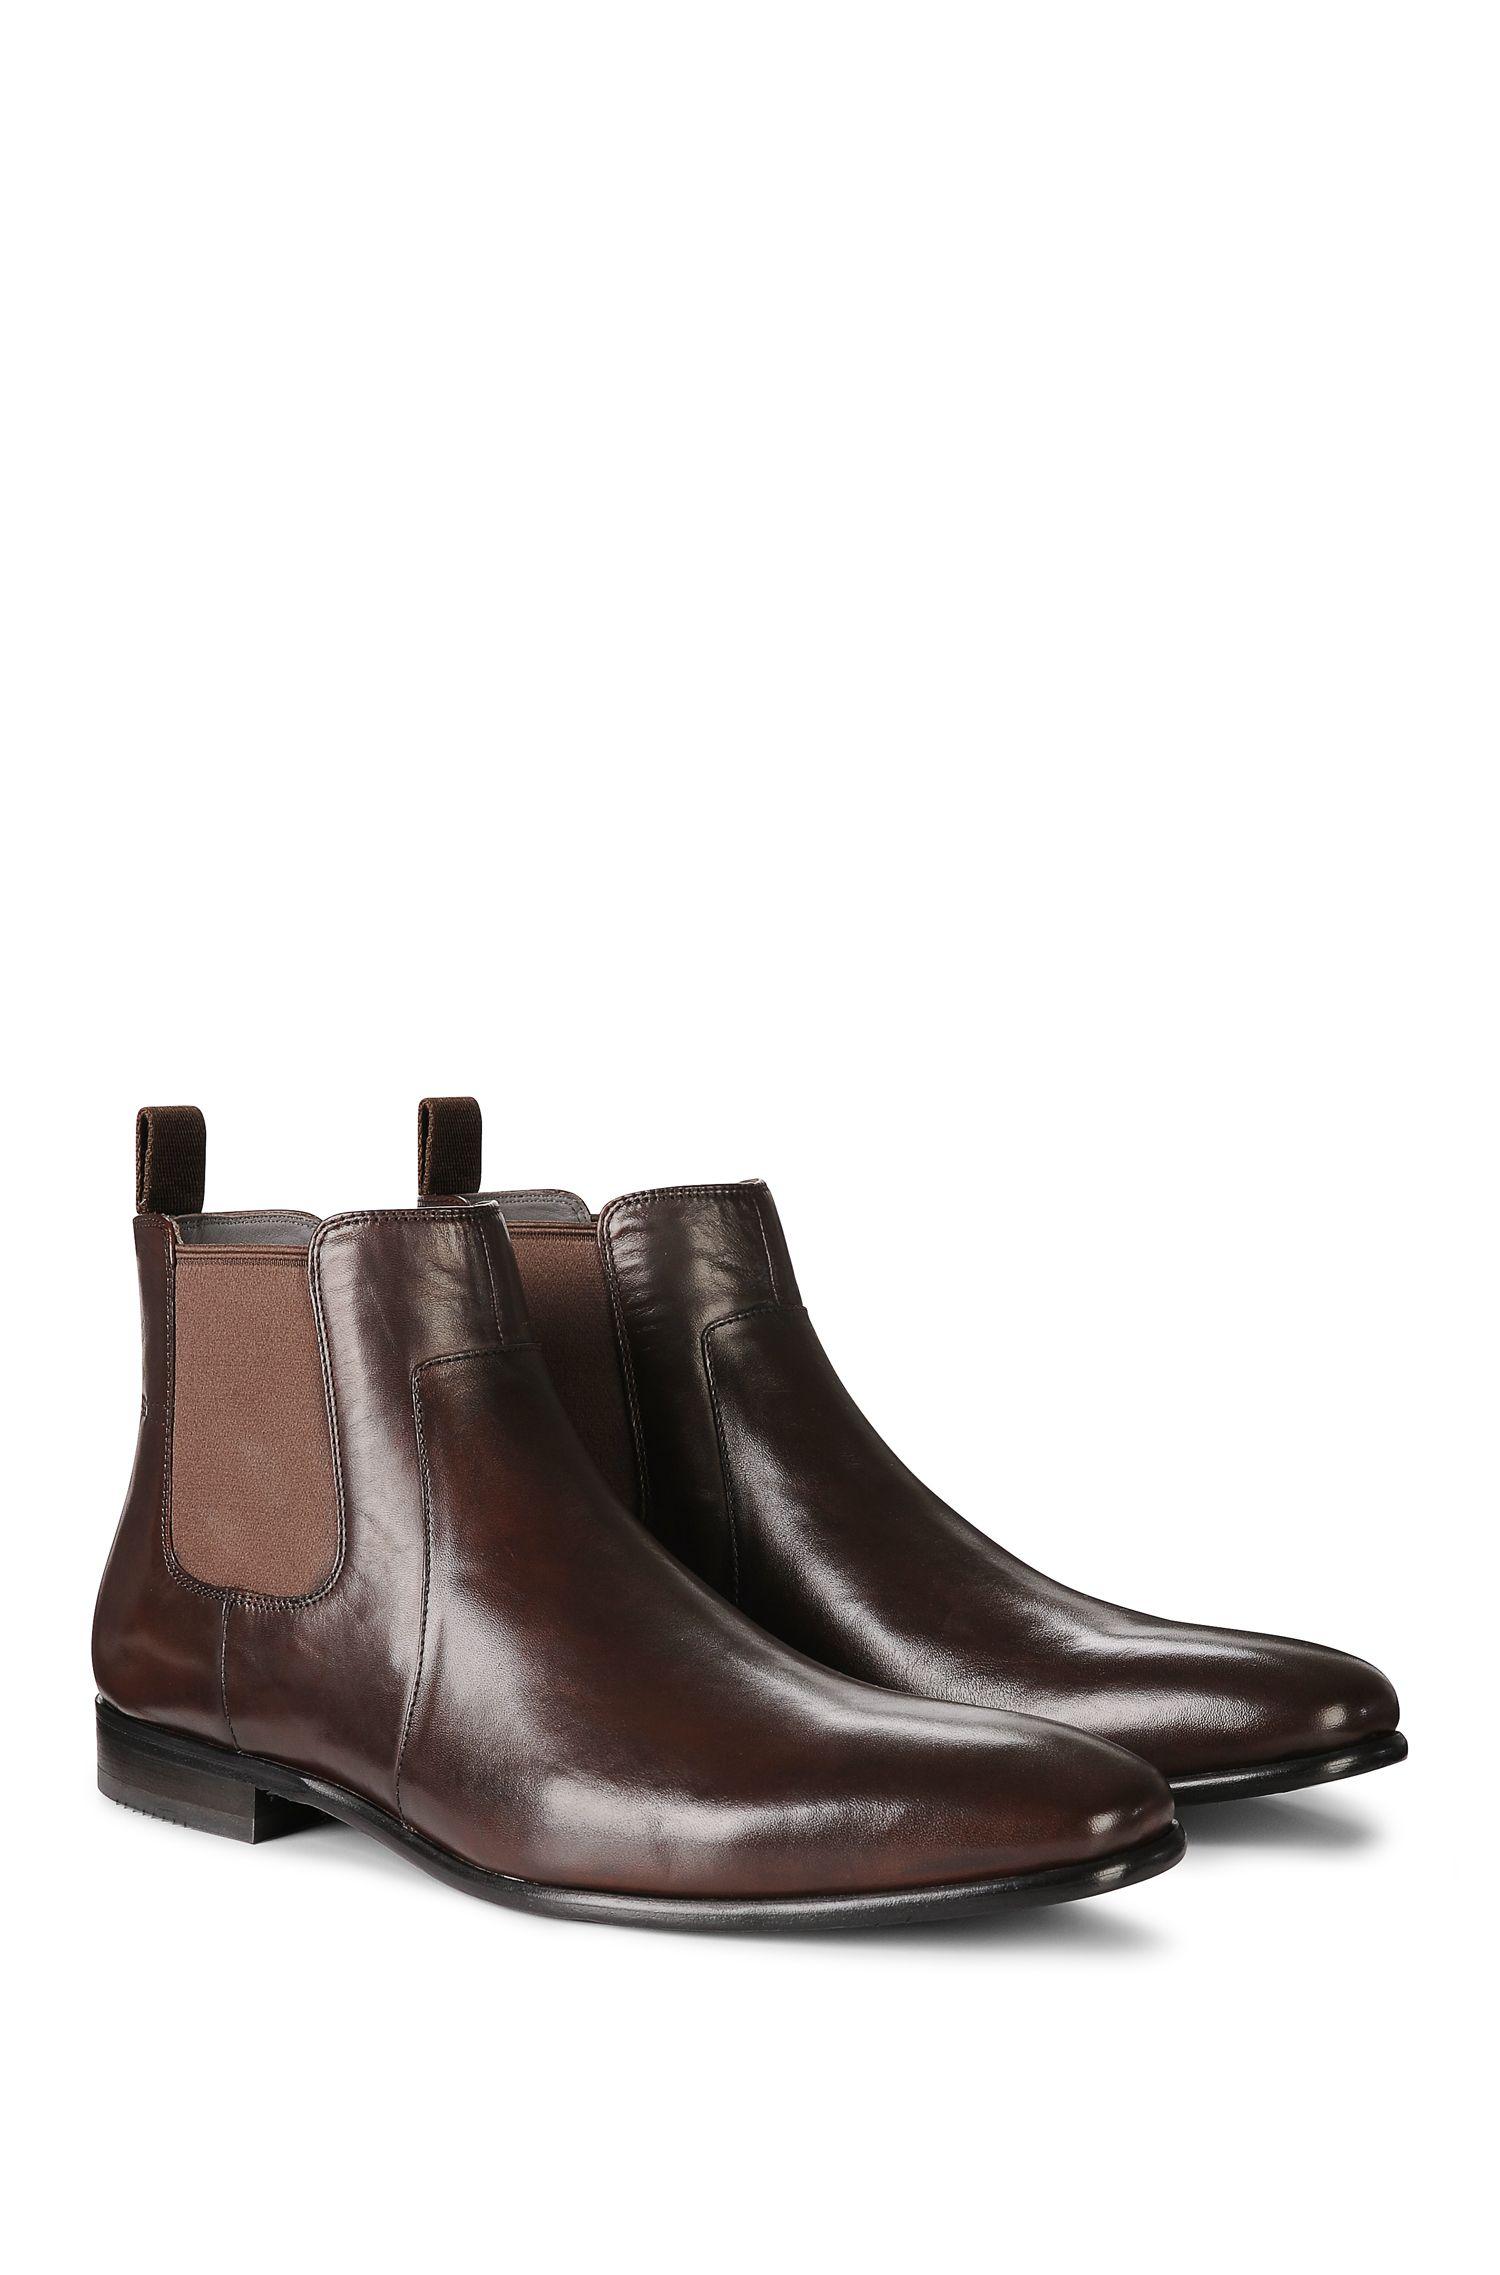 'C-Hubot' | Calfskin Chelsea Boots